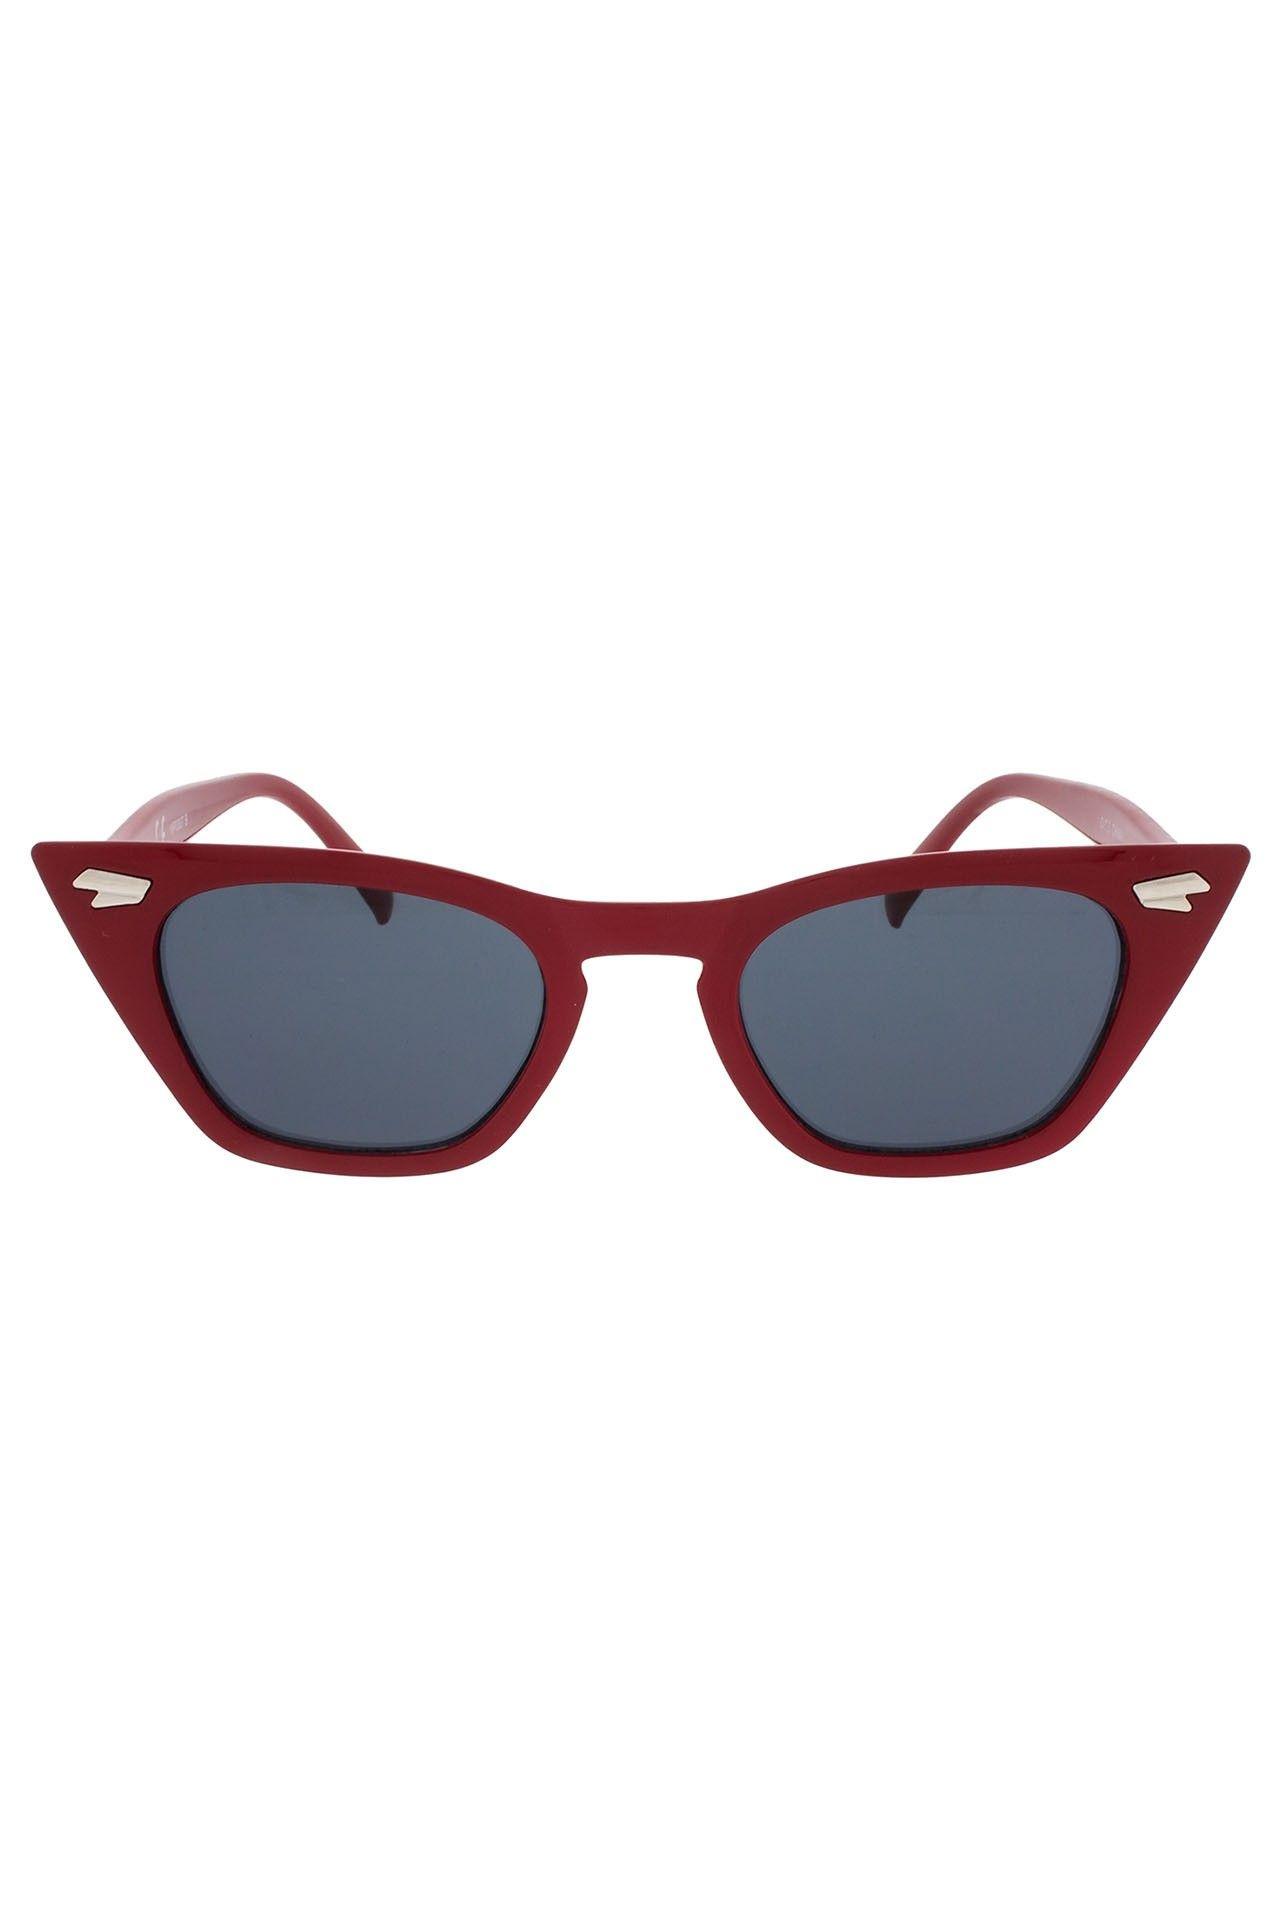 Afbeelding van Icon Eyewear 18P0337 18P0337 Zonnebril Red